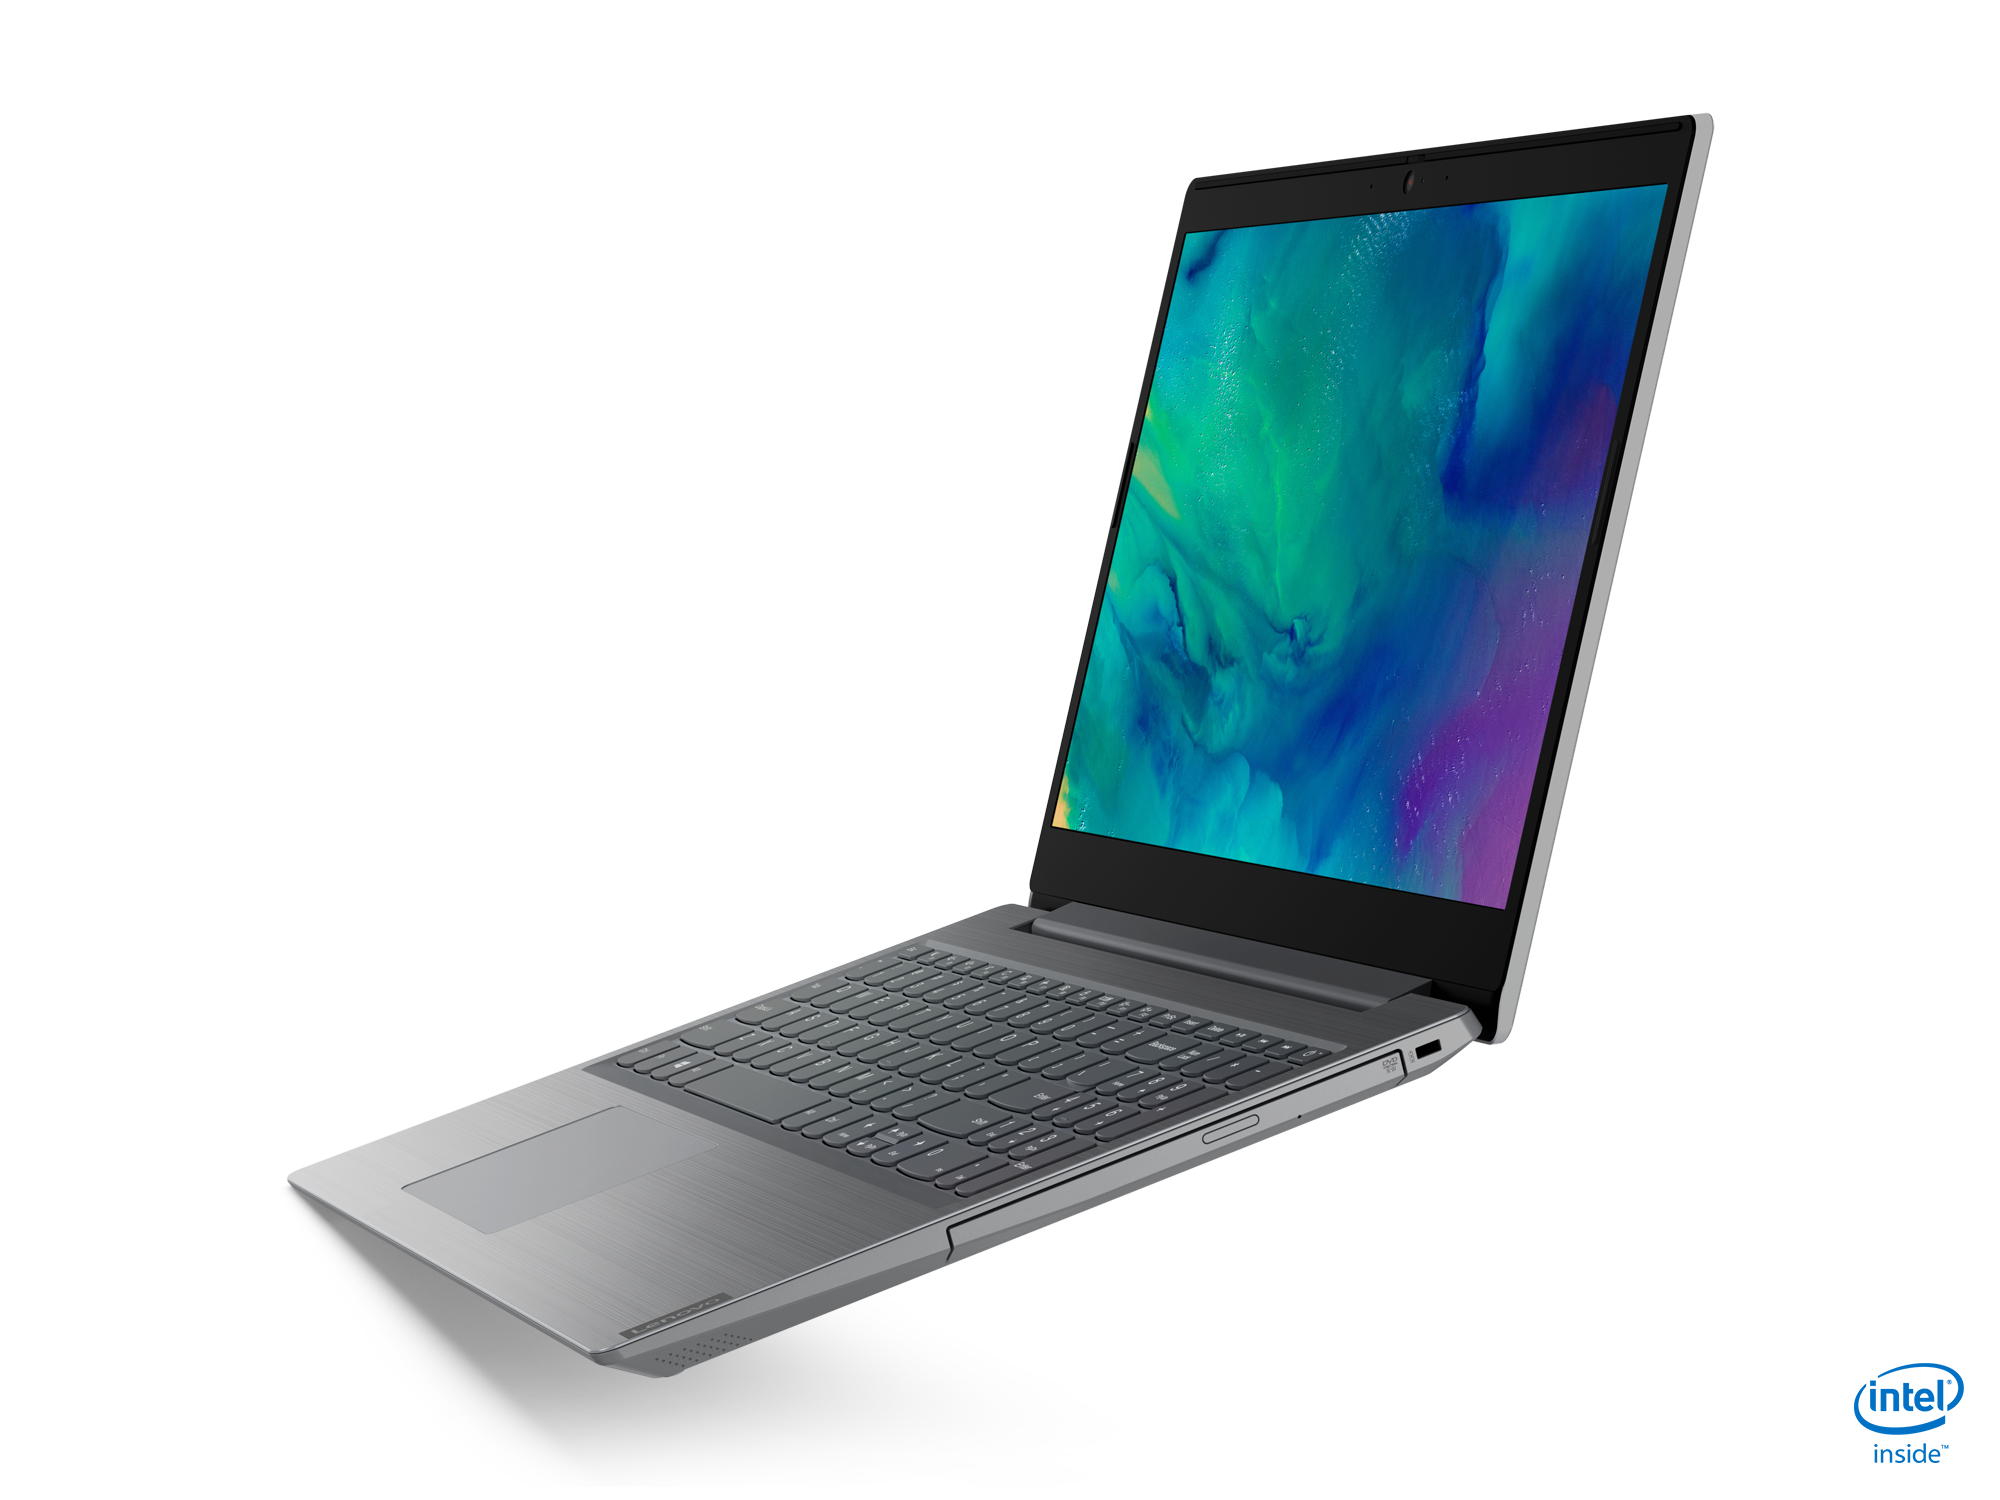 Lenovo IdeaPad L3 15IML05 Intel Core i5 10210U 12GB 256GB SSD Freedos 15.6 inç HD 81Y300GTTXT1